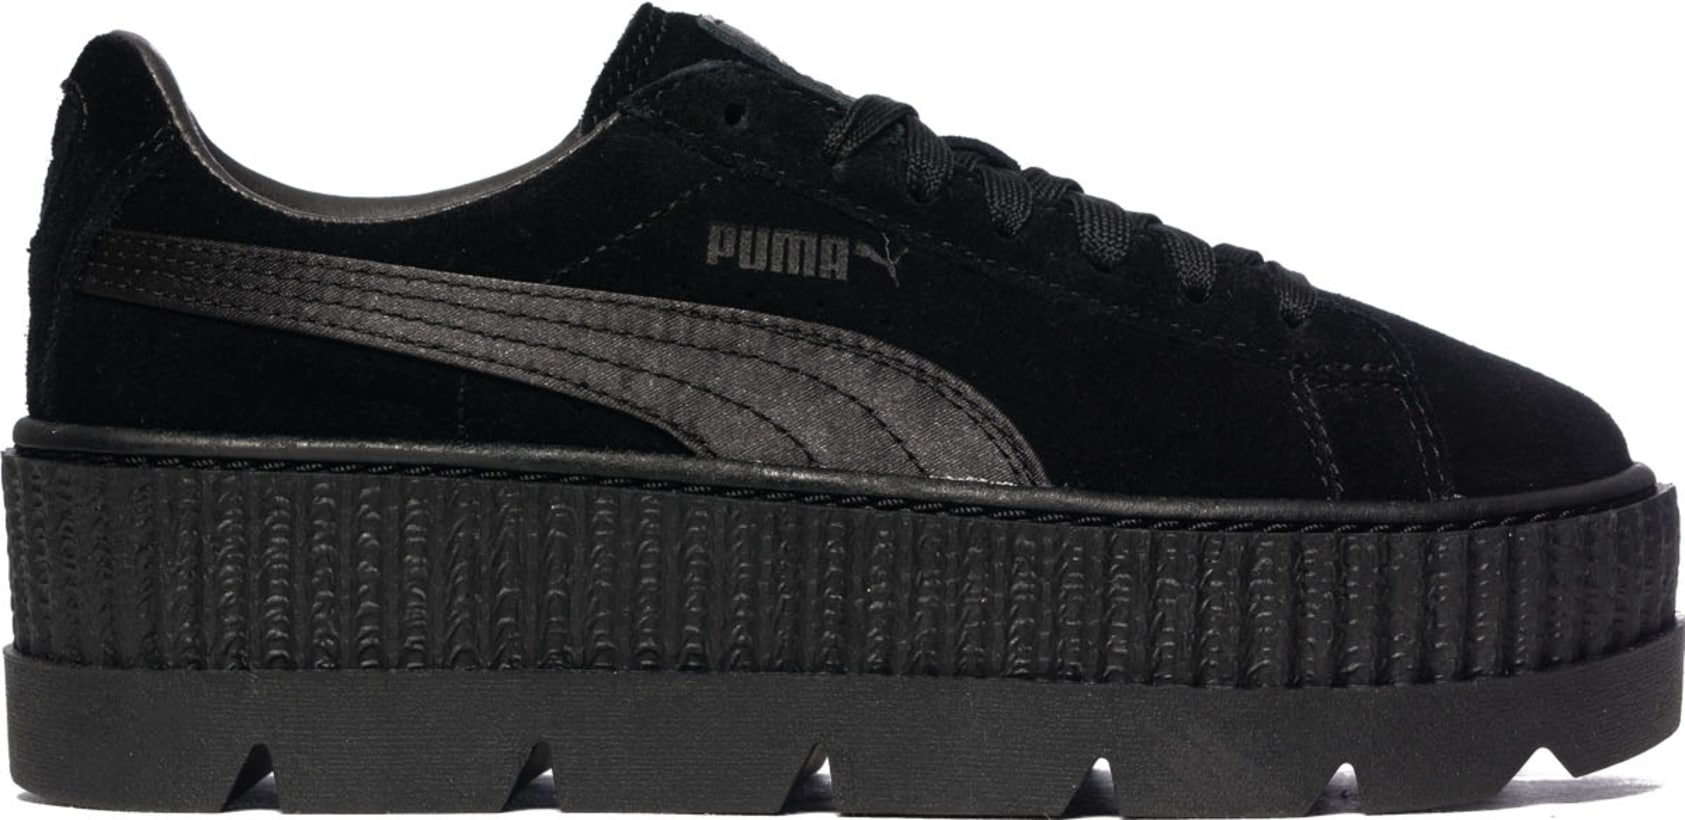 the best attitude 4b132 964f1 Puma - Fenty Cleated Creeper - Puma Black